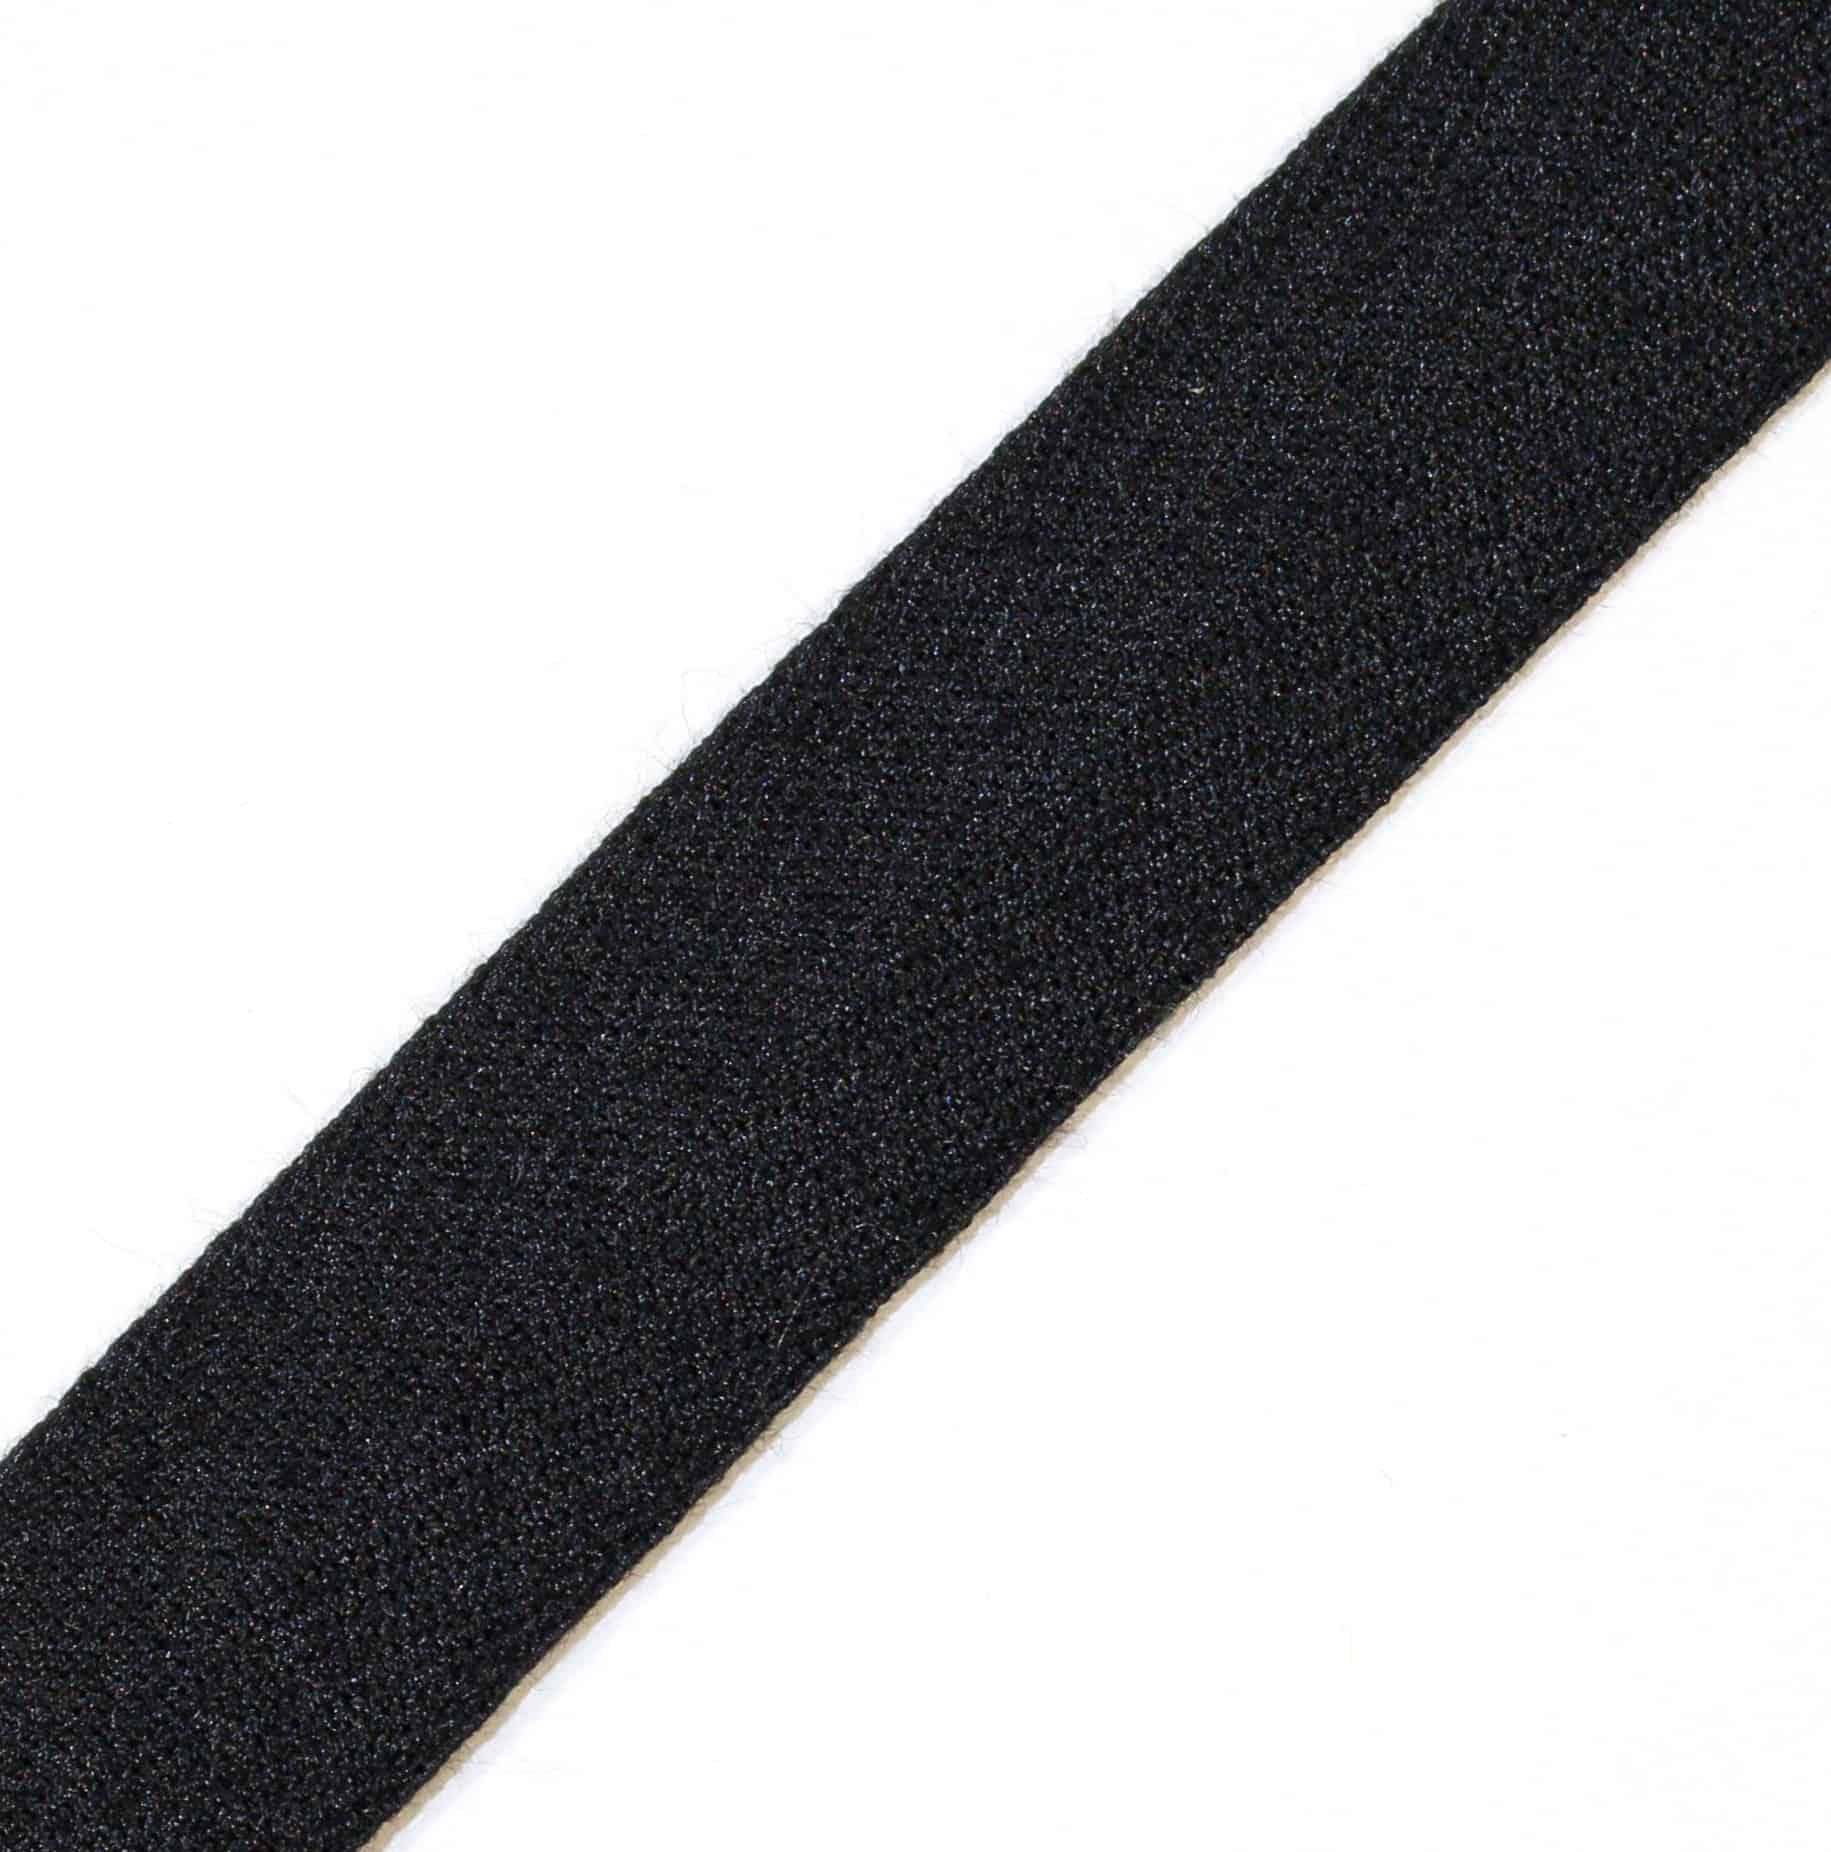 20mm Black Spun Nomex® Tape Webbing